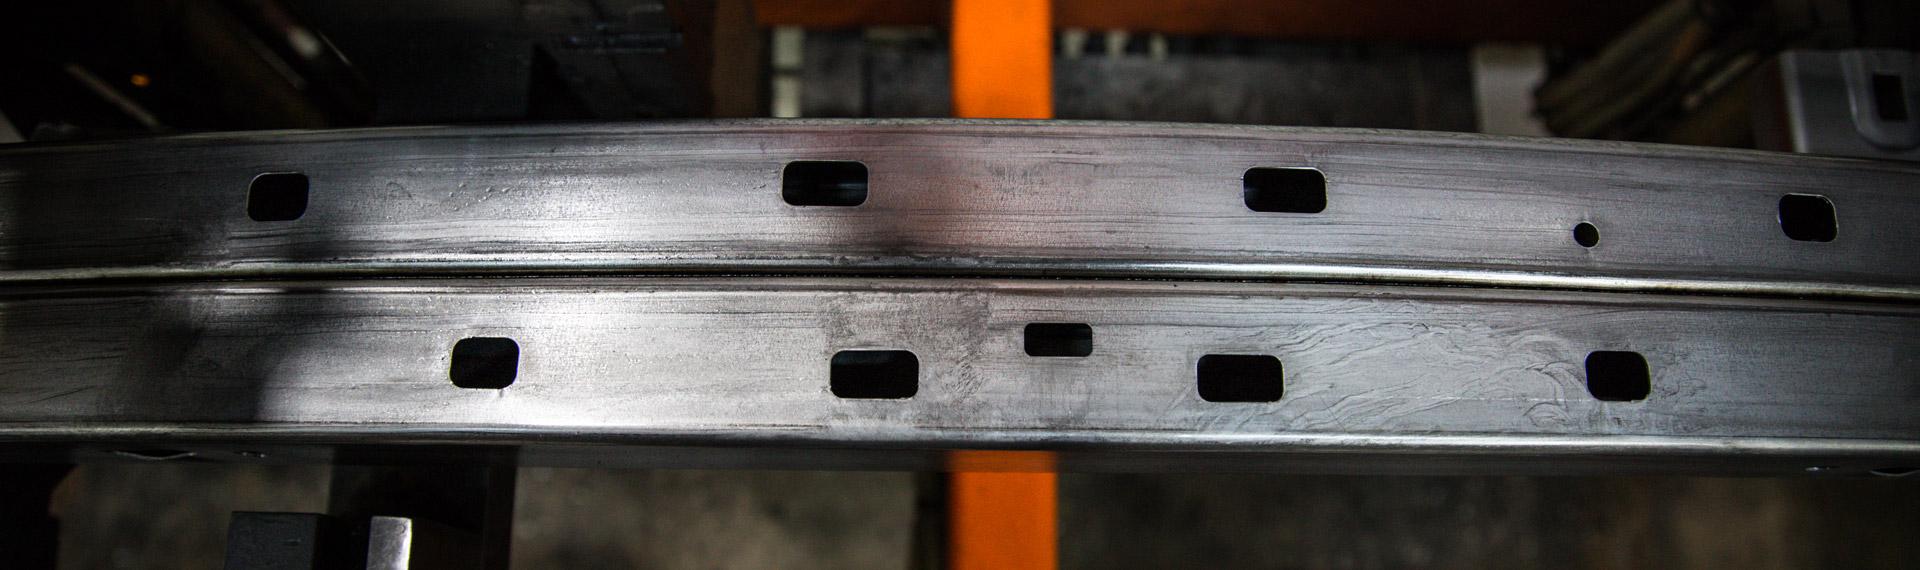 Stoßfänger aus Docol Stahl